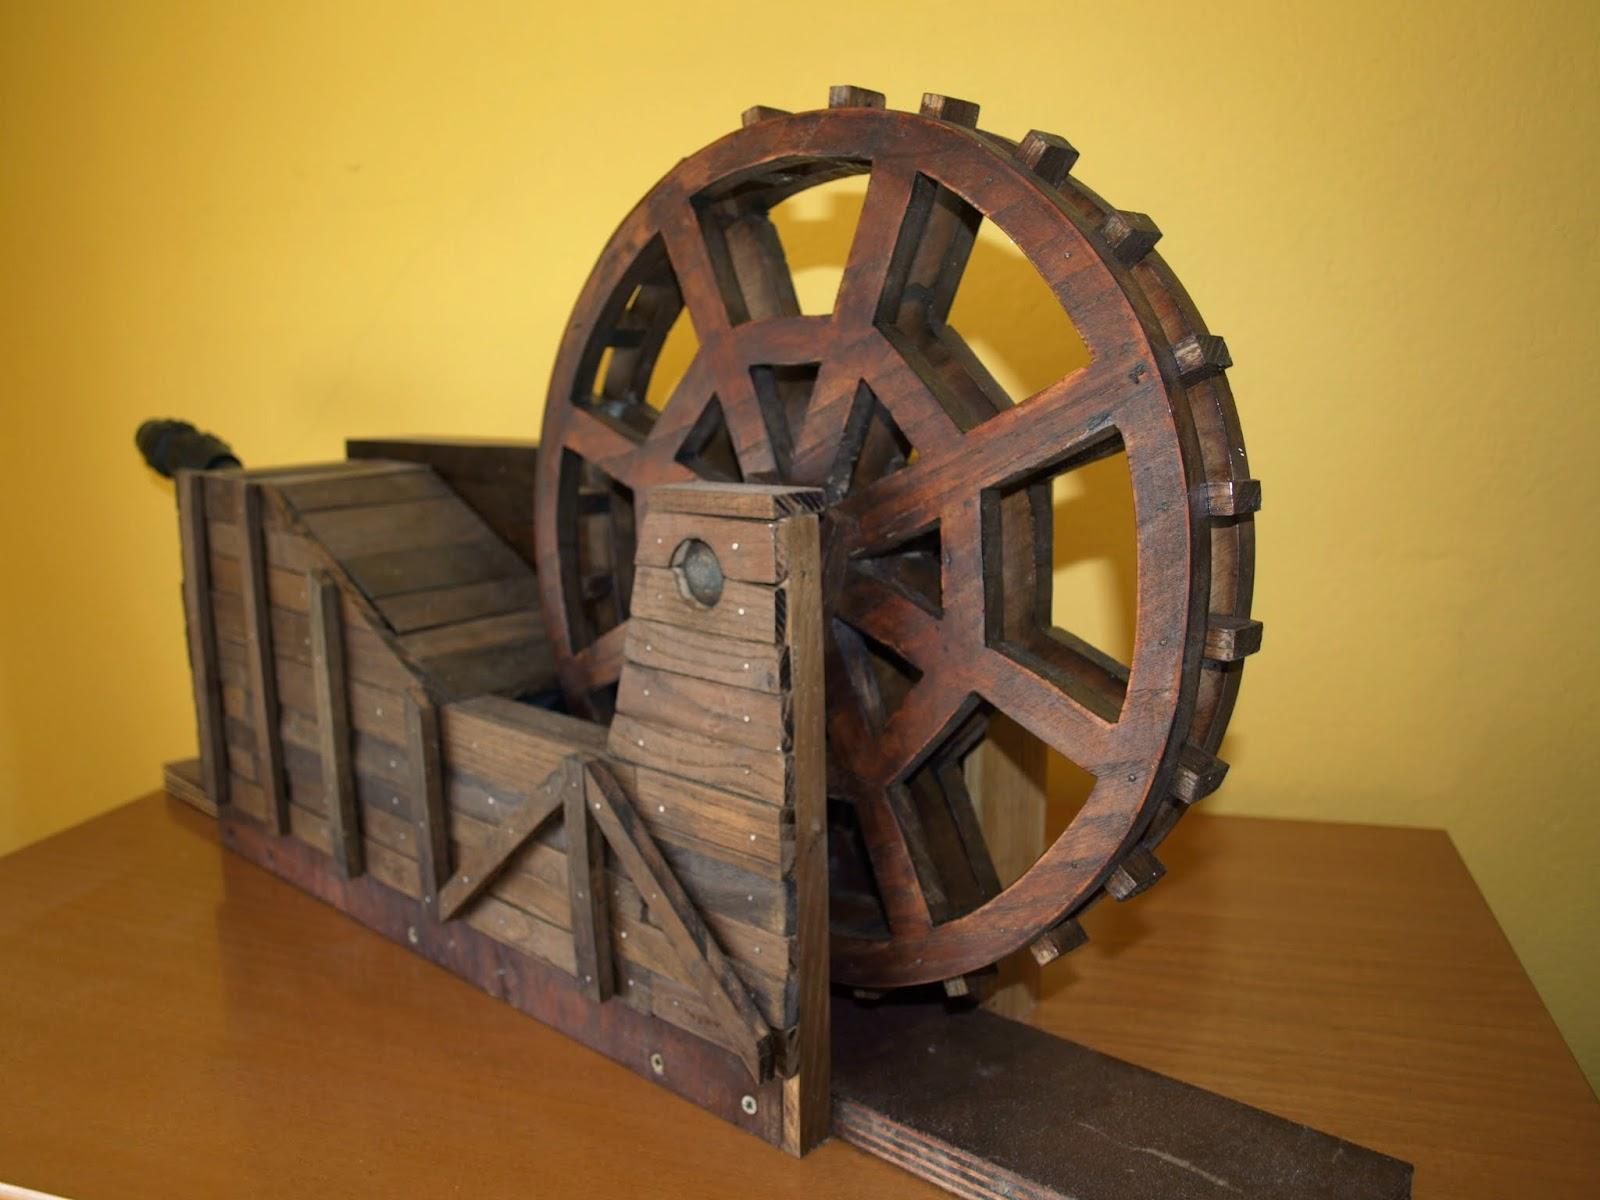 rueda molino artesanal rodrigo garcia istillarty